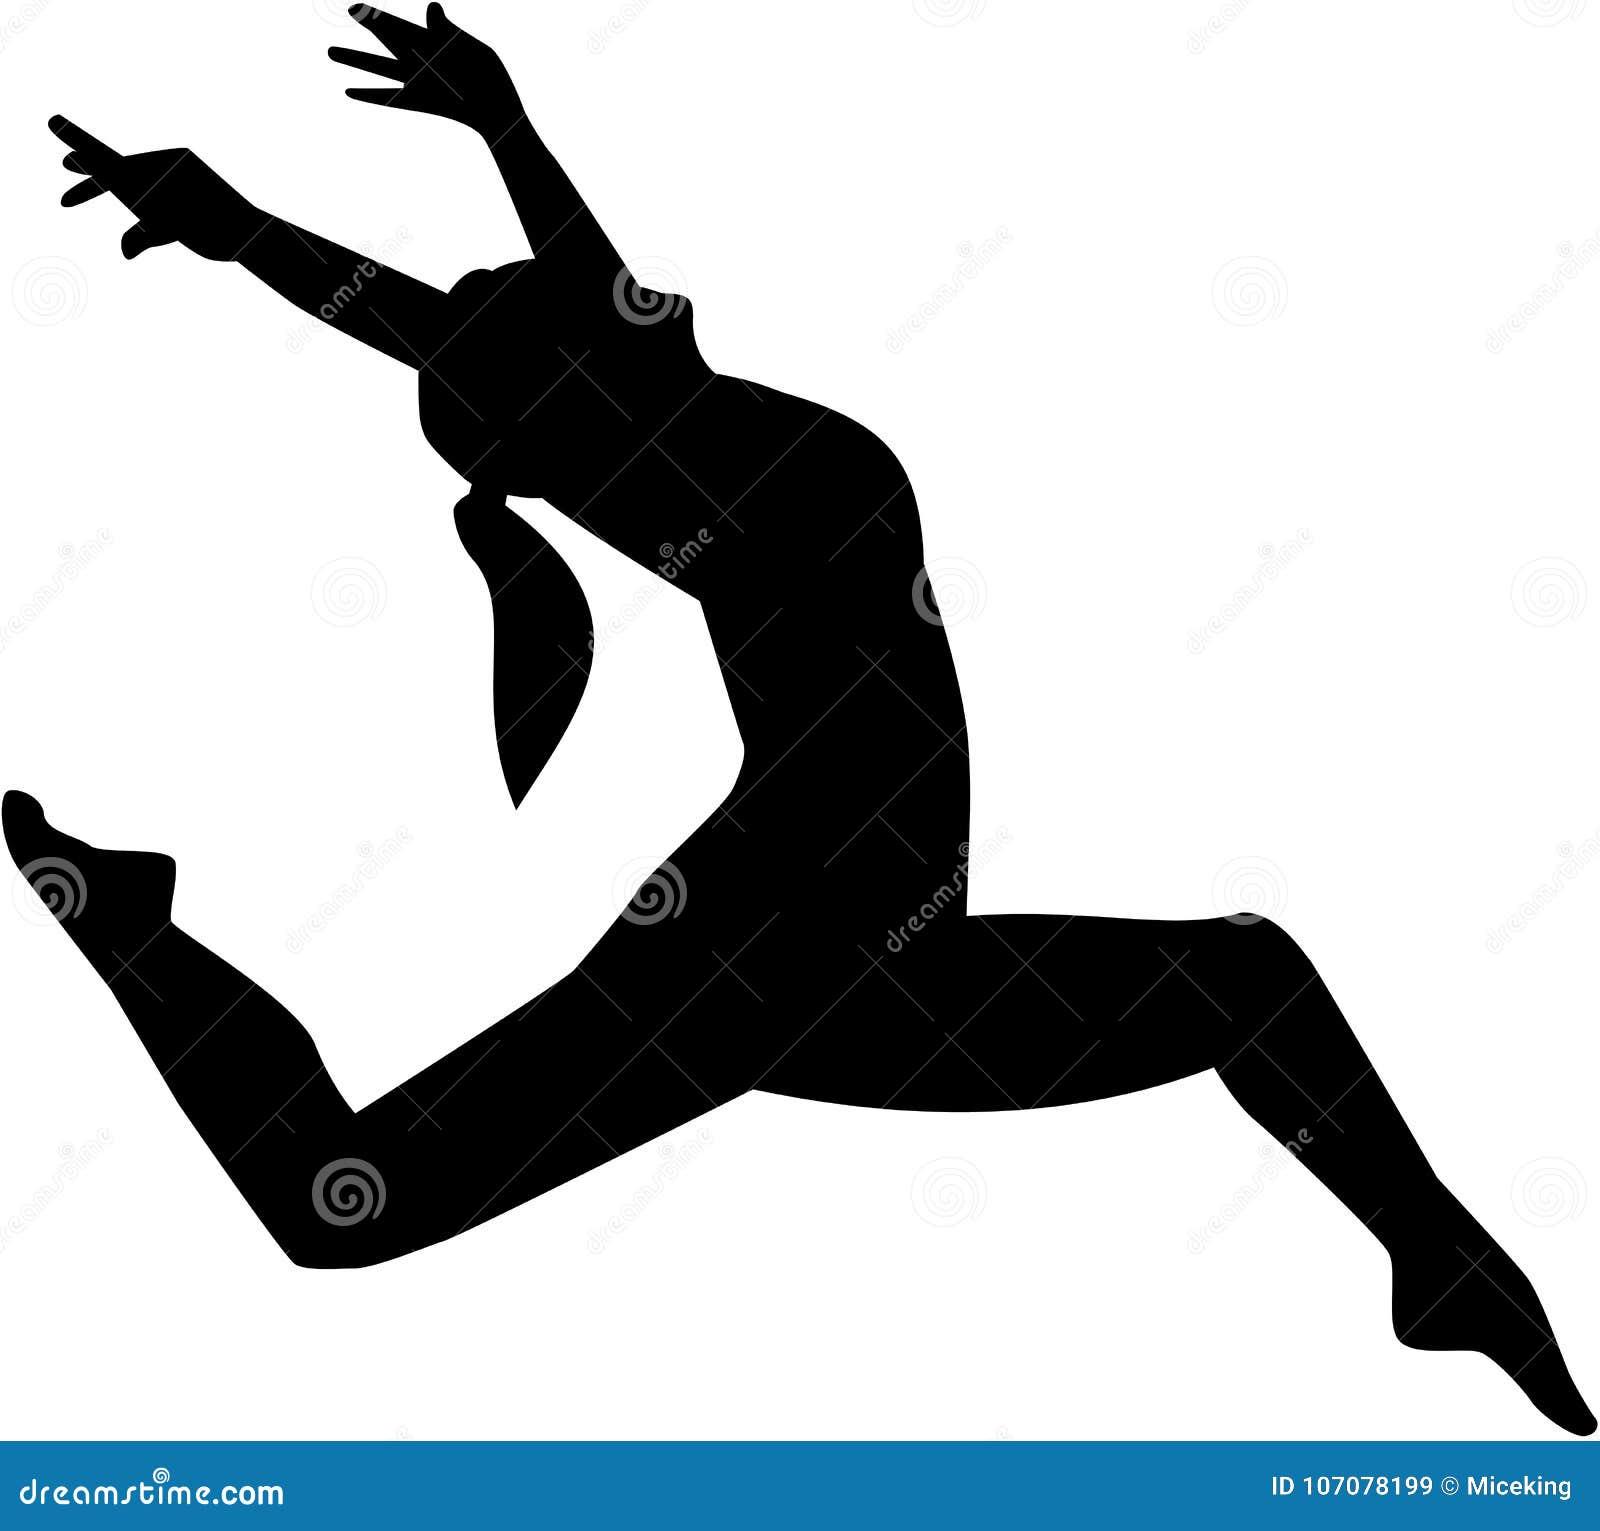 Jazz Dancer Woman Stock Vector Illustration Of Jumping 107078199